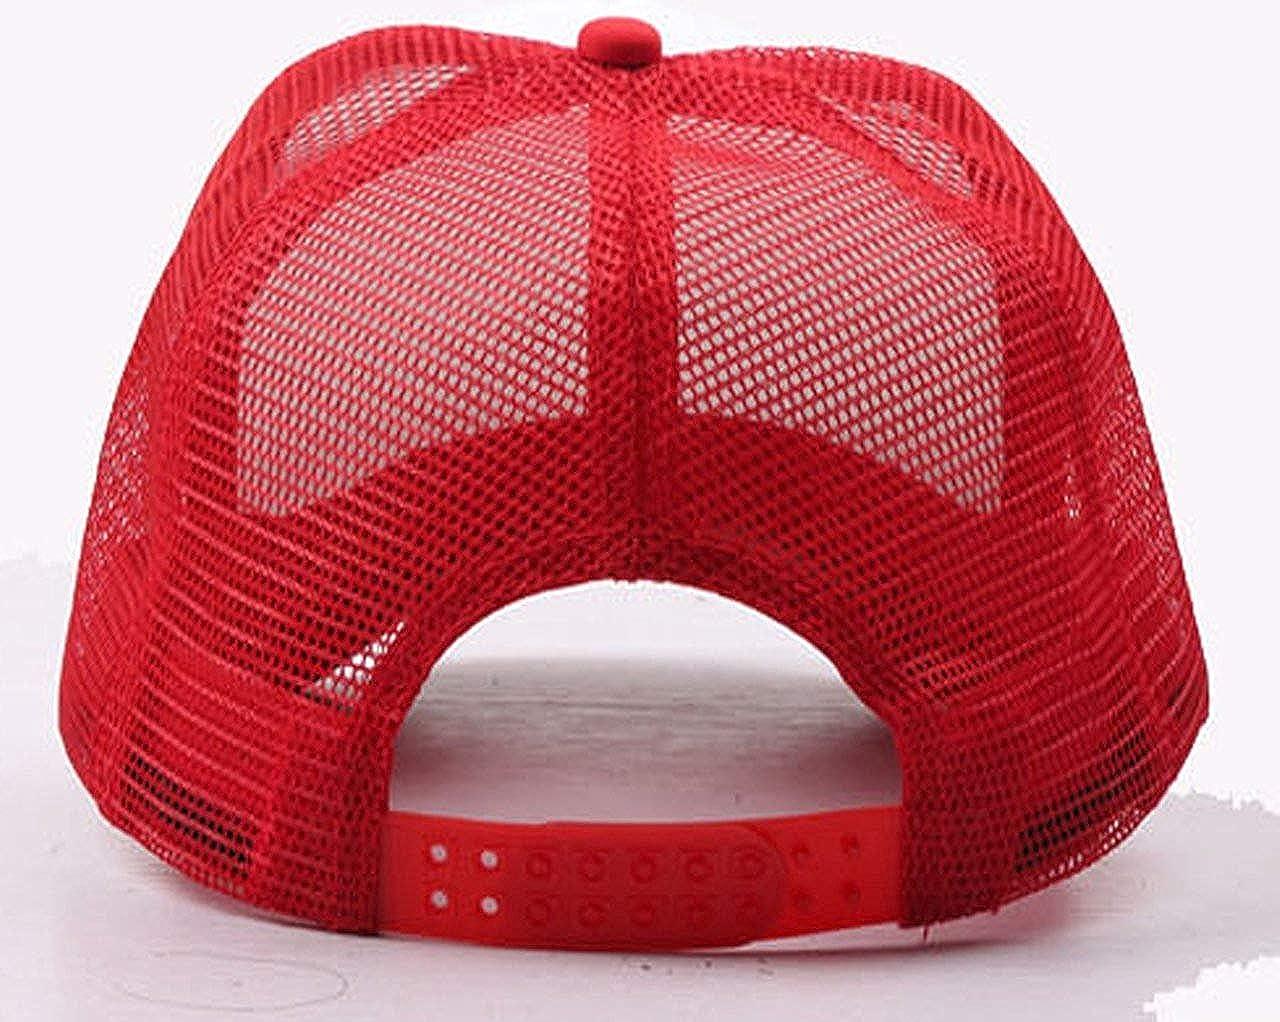 nikeely Candy Inspector Fashion Mesh Trucker Hat Adjustable Baseball Cap